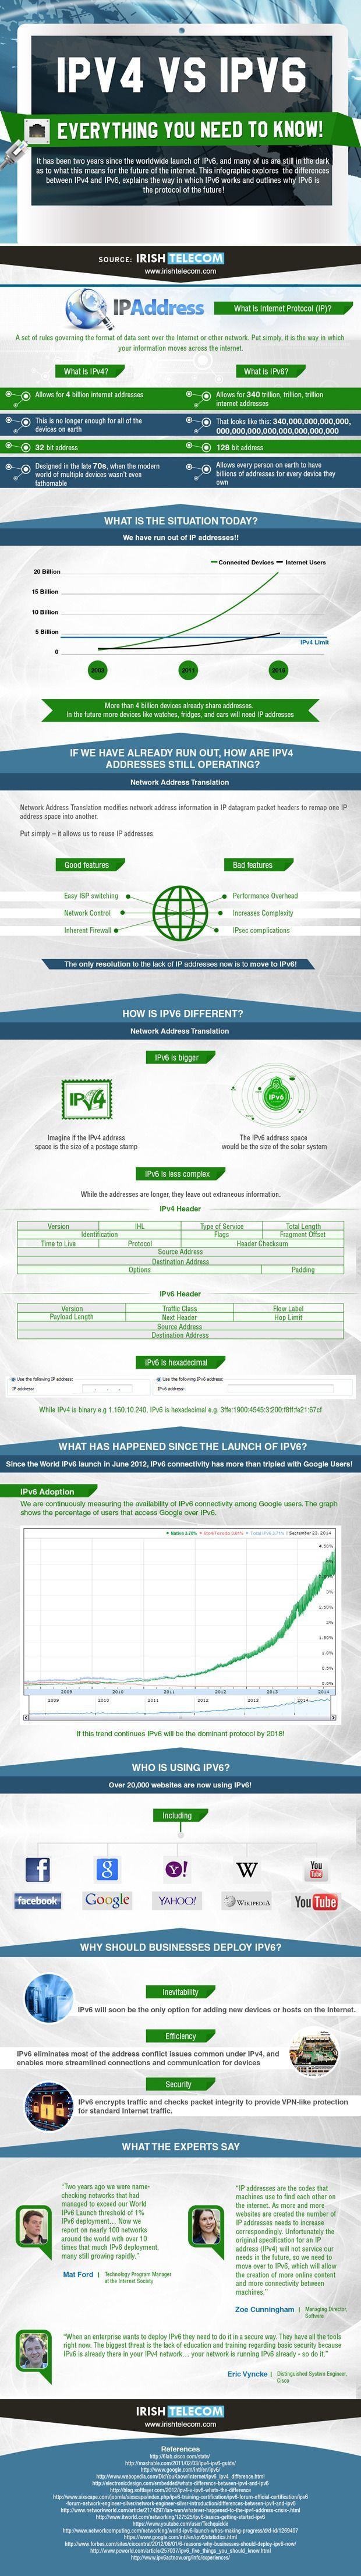 IPv4 vs IPv6 infographic